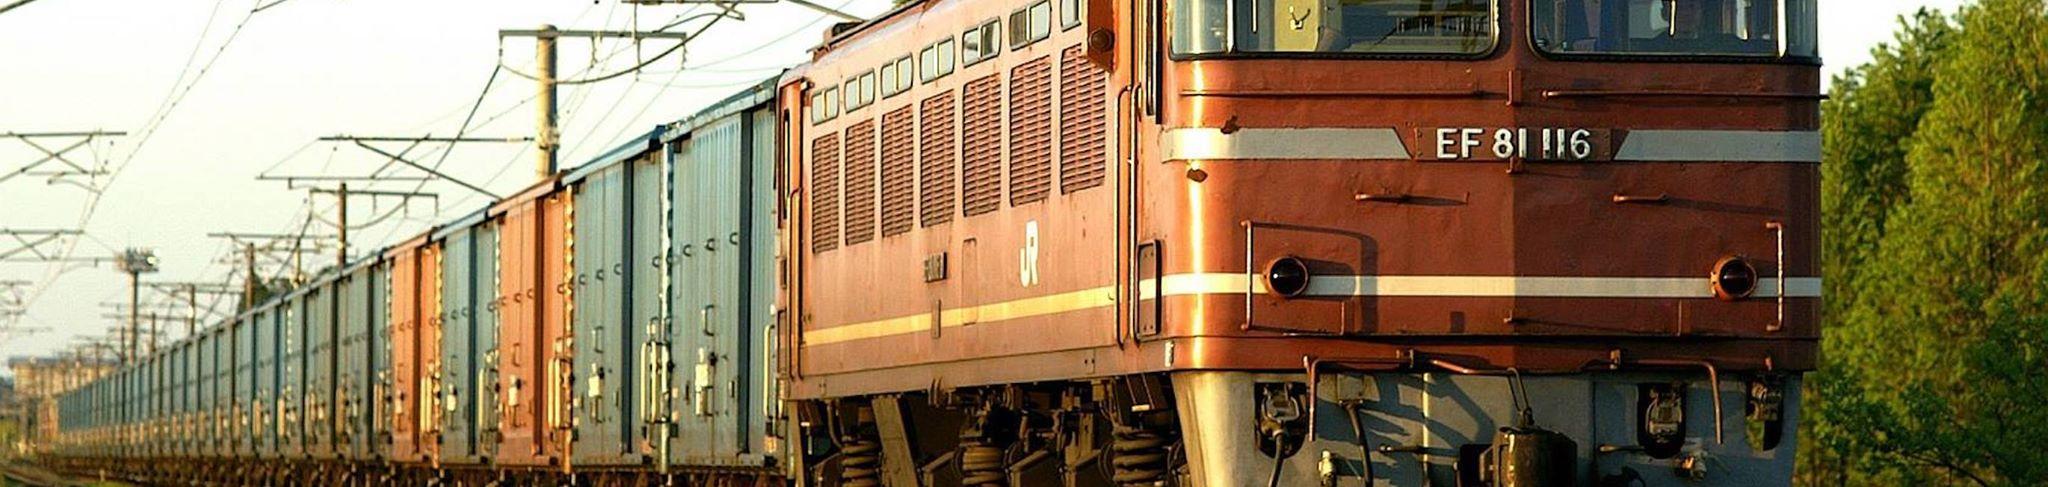 raudteetransport